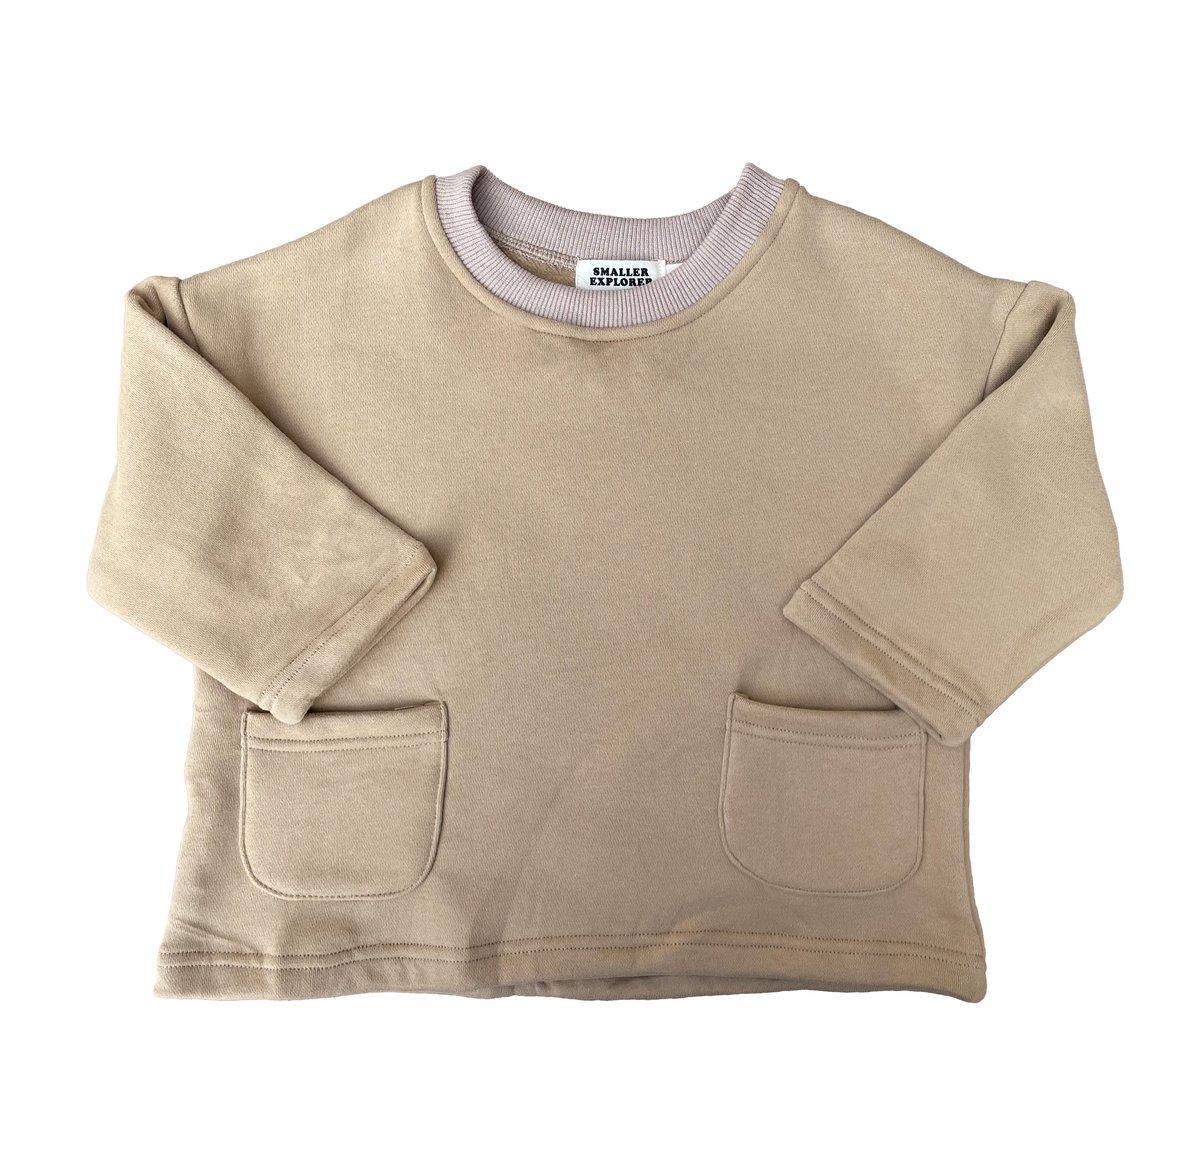 Image of Retro Sweatshirt - Sand